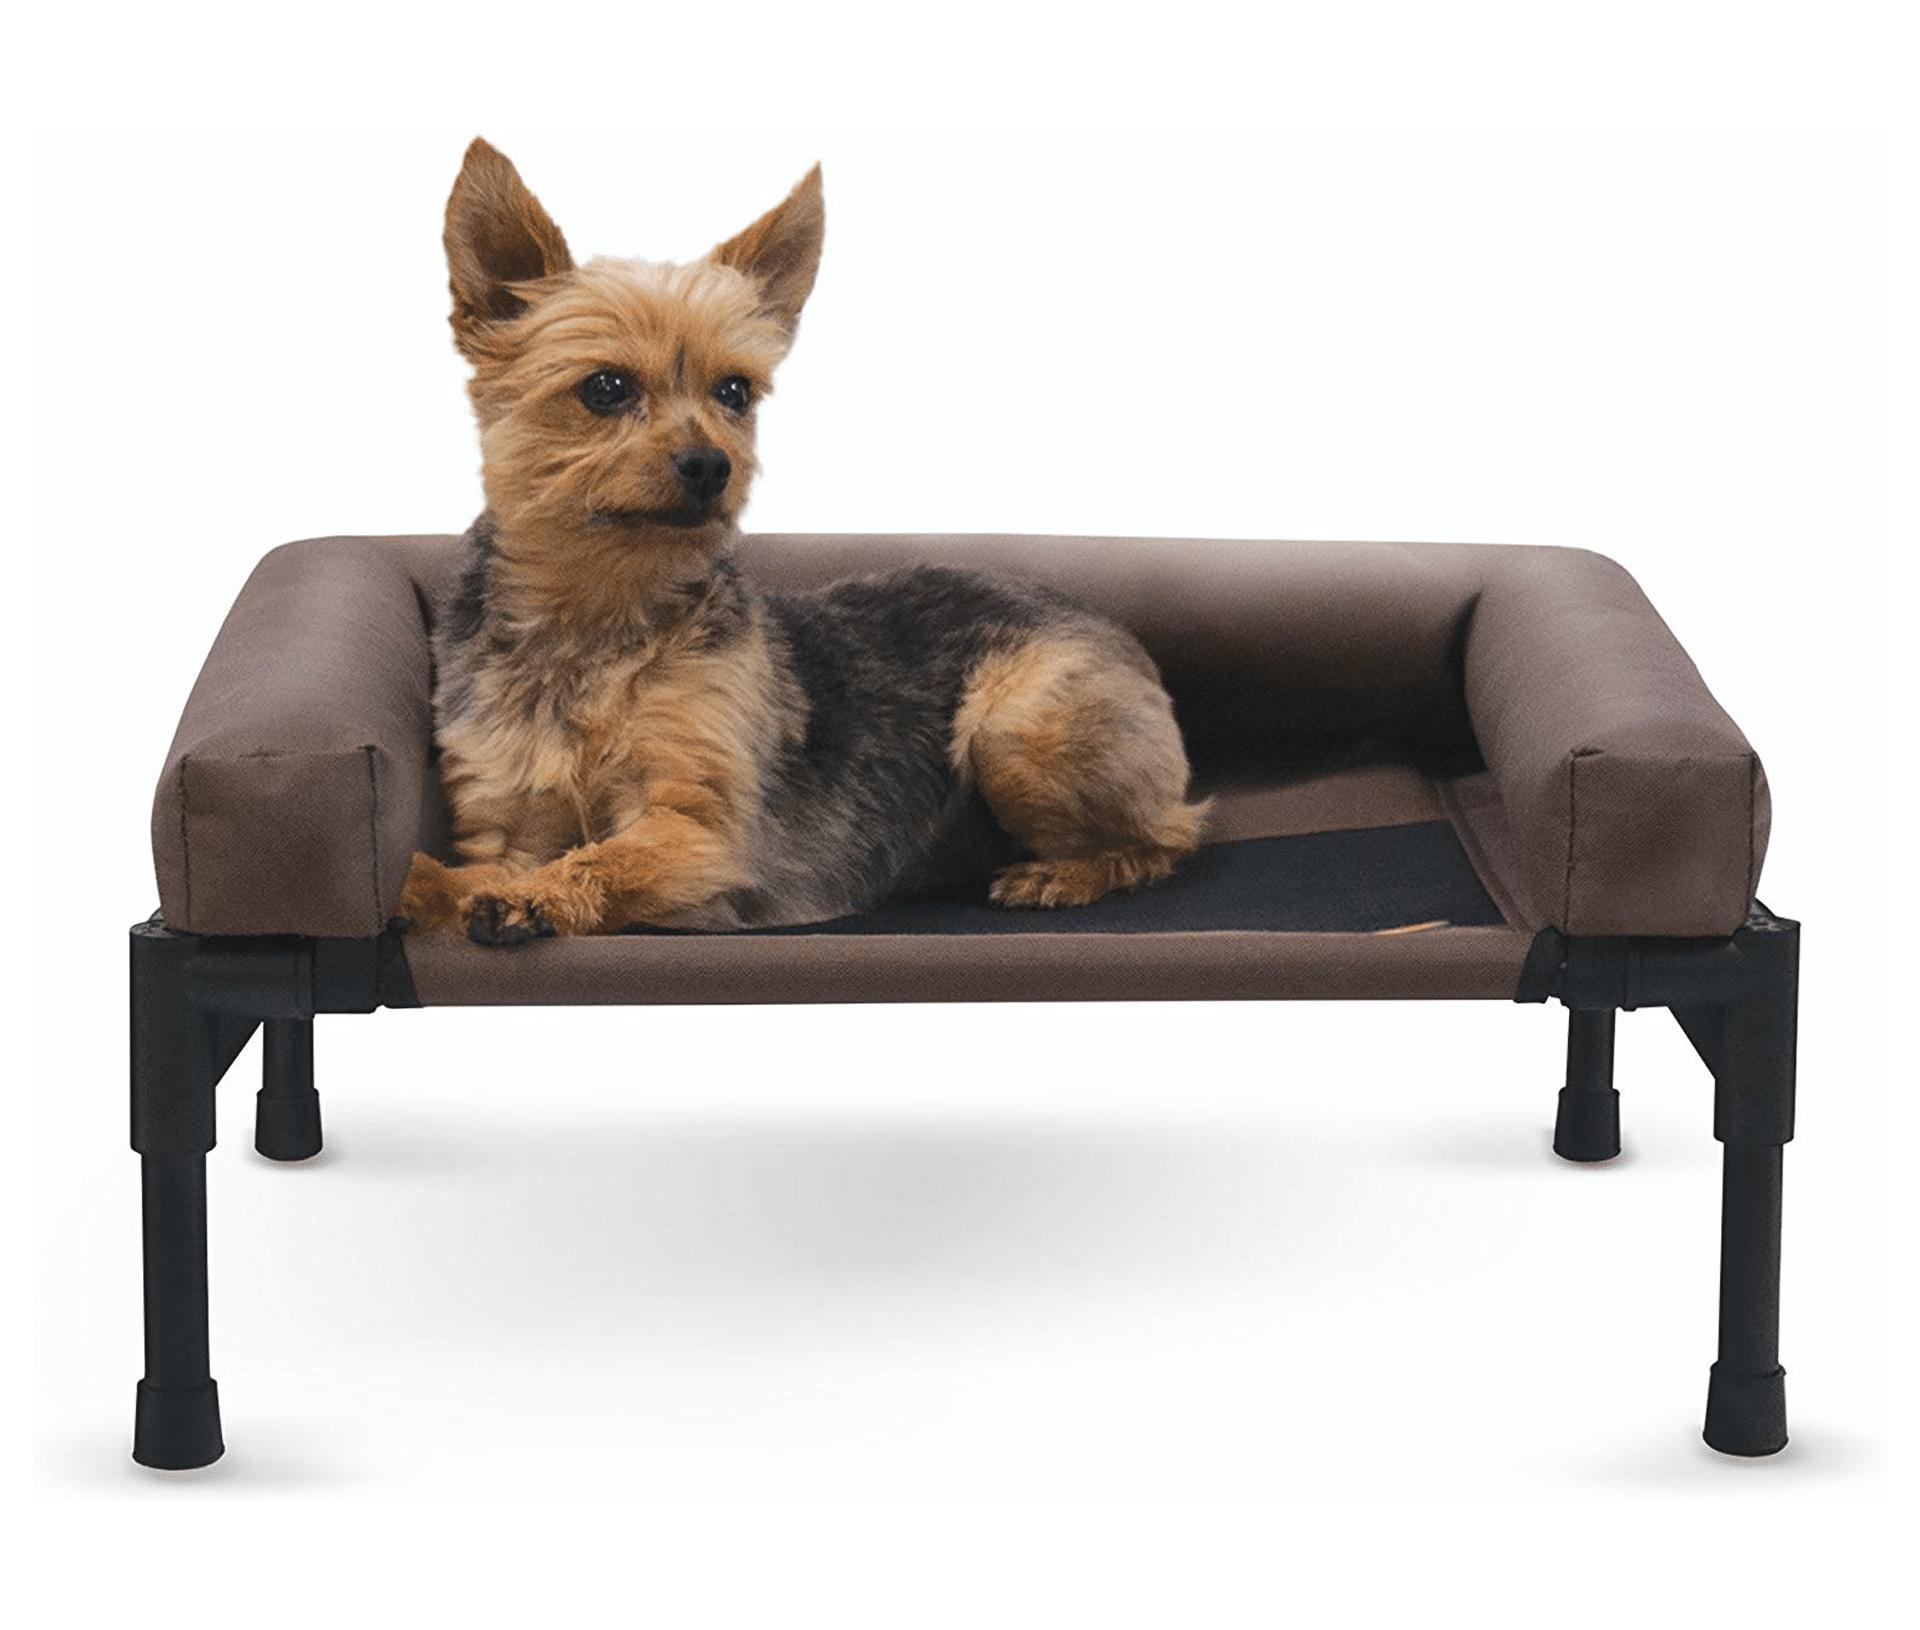 K&H Pet Products Original Bolster Pet Cot